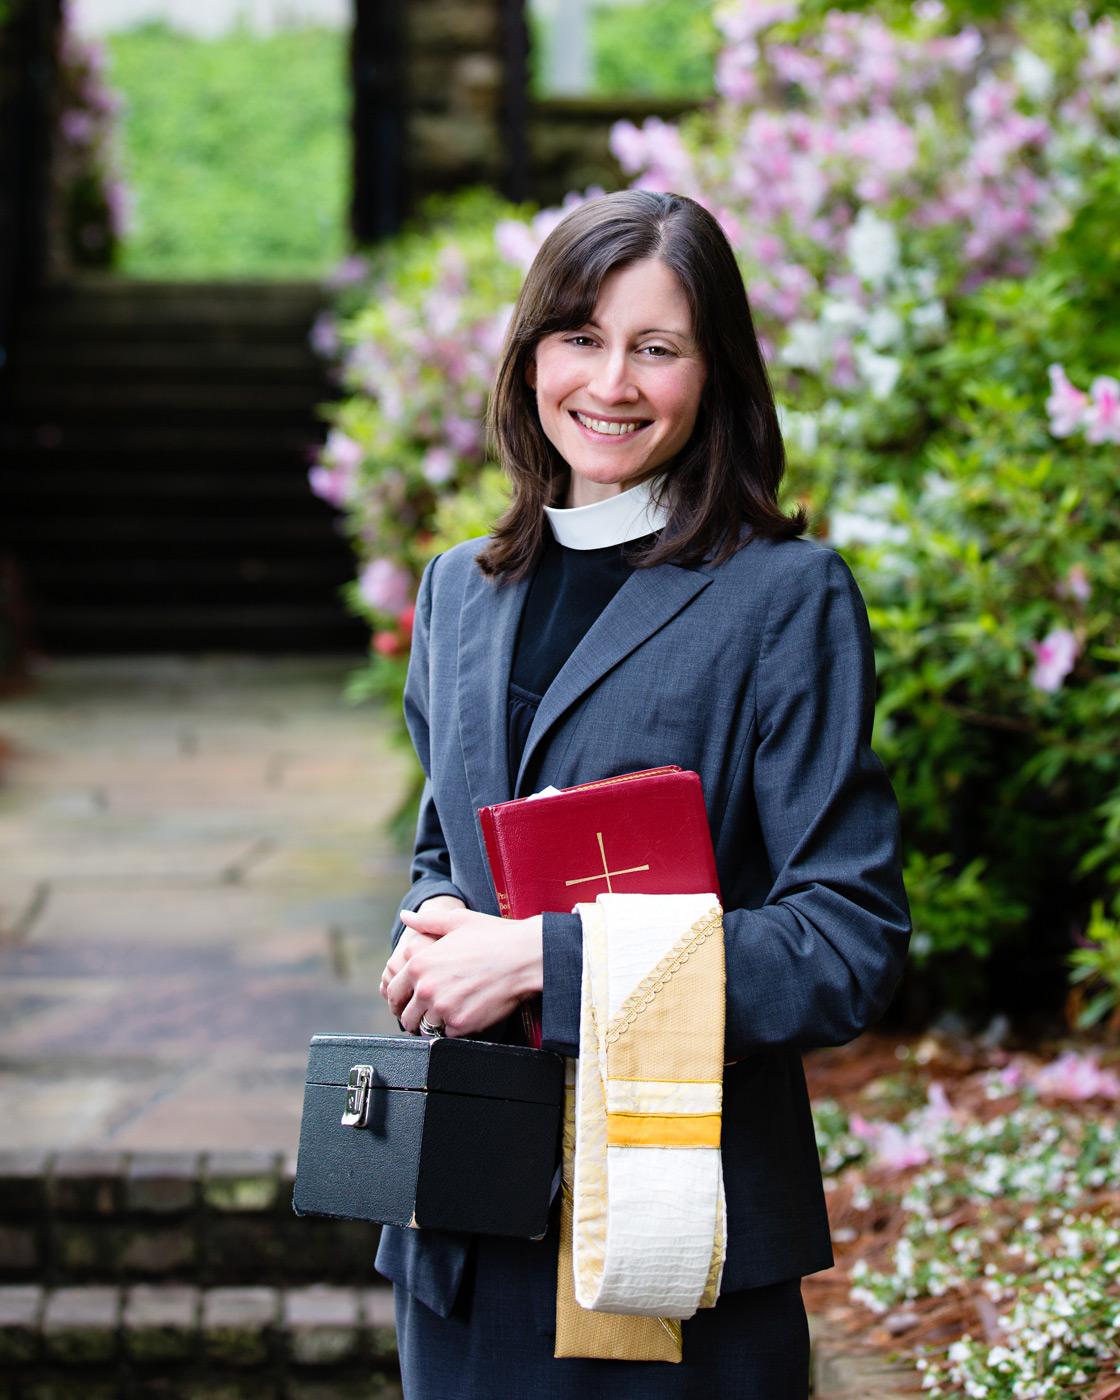 Female episcopal priest image in a church garden